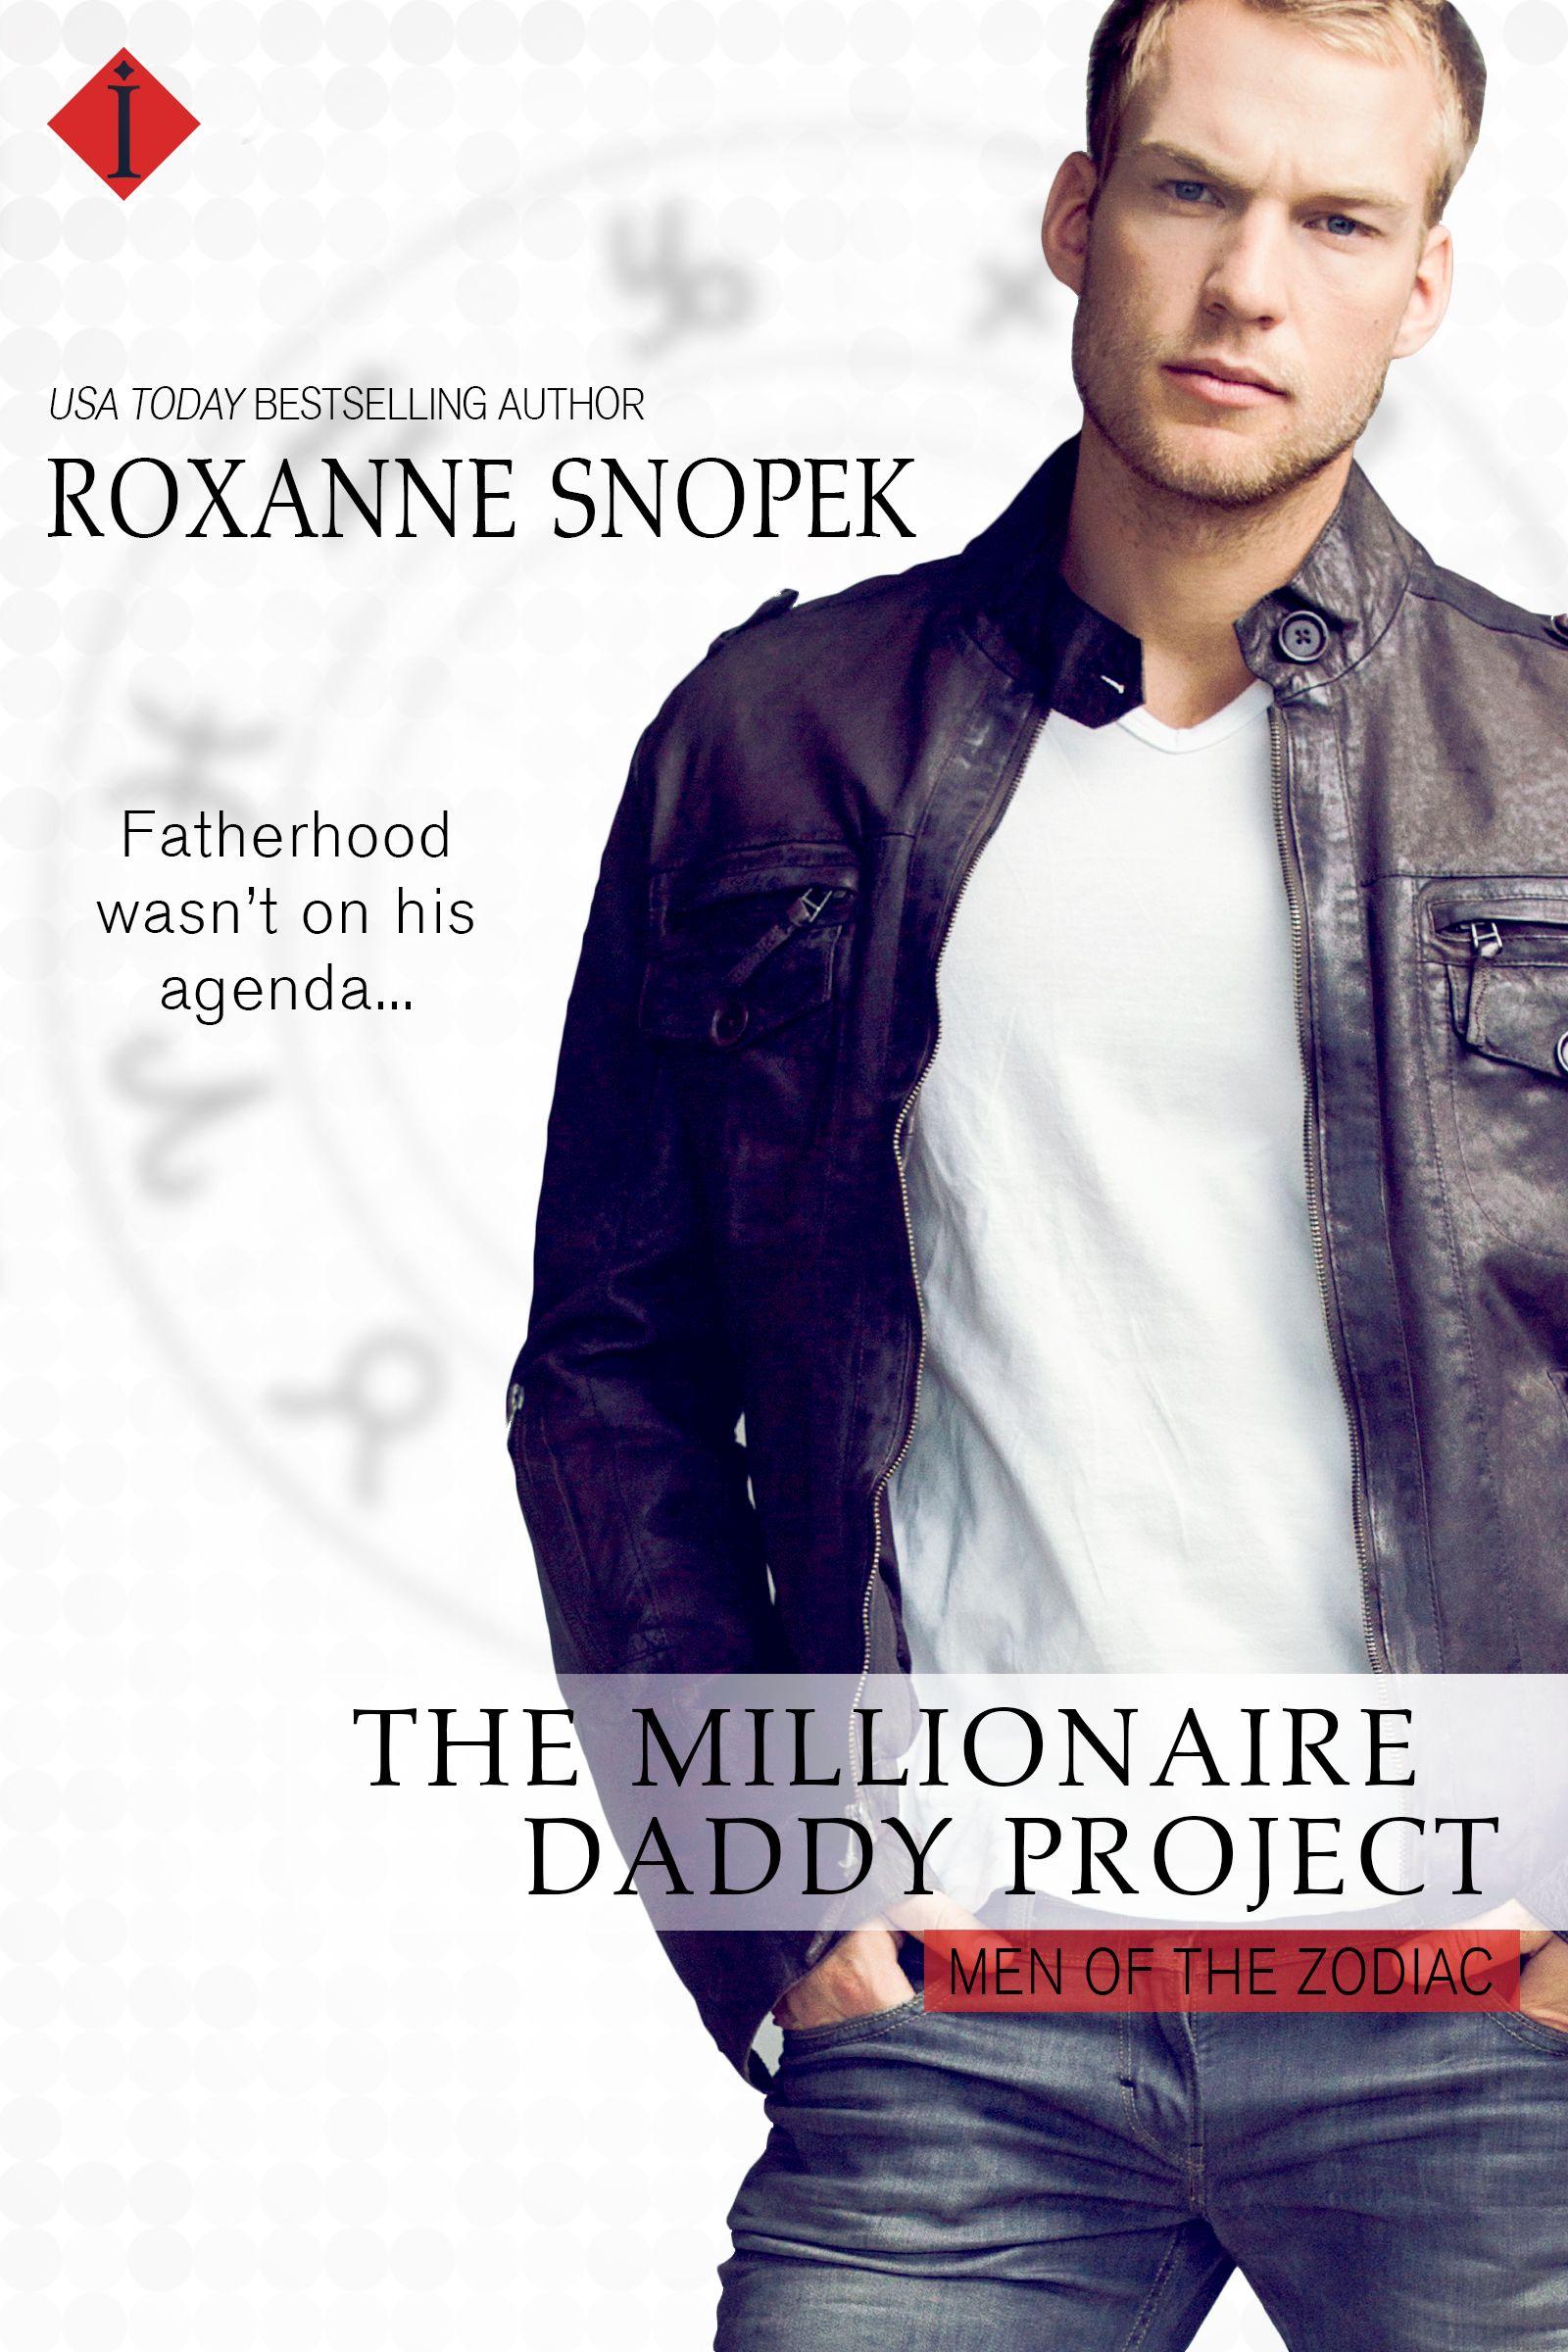 The Millionaire Daddy Project by Roxanne Snopek. Contemporary Romance. $0.99 http://www.ebooksoda.com/ebook-deals/the-millionaire-daddy-project-by-roxanne-snopek